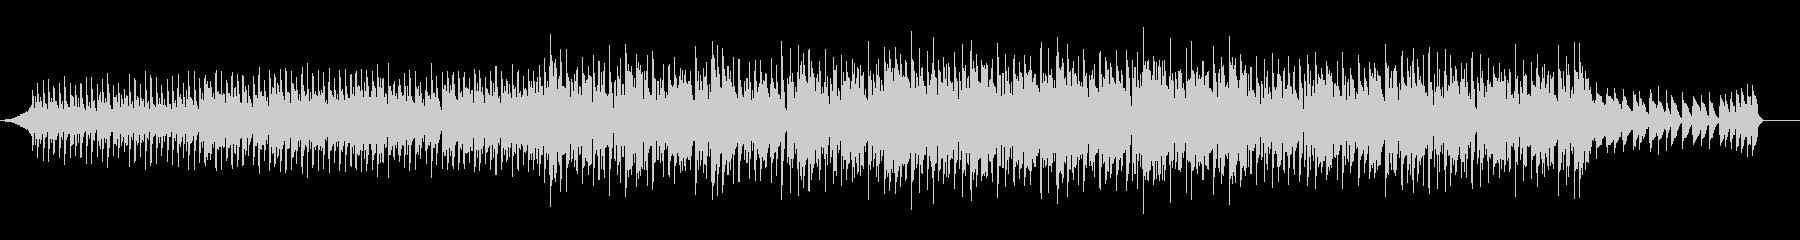 M1ピアノのダンスミュージックの未再生の波形